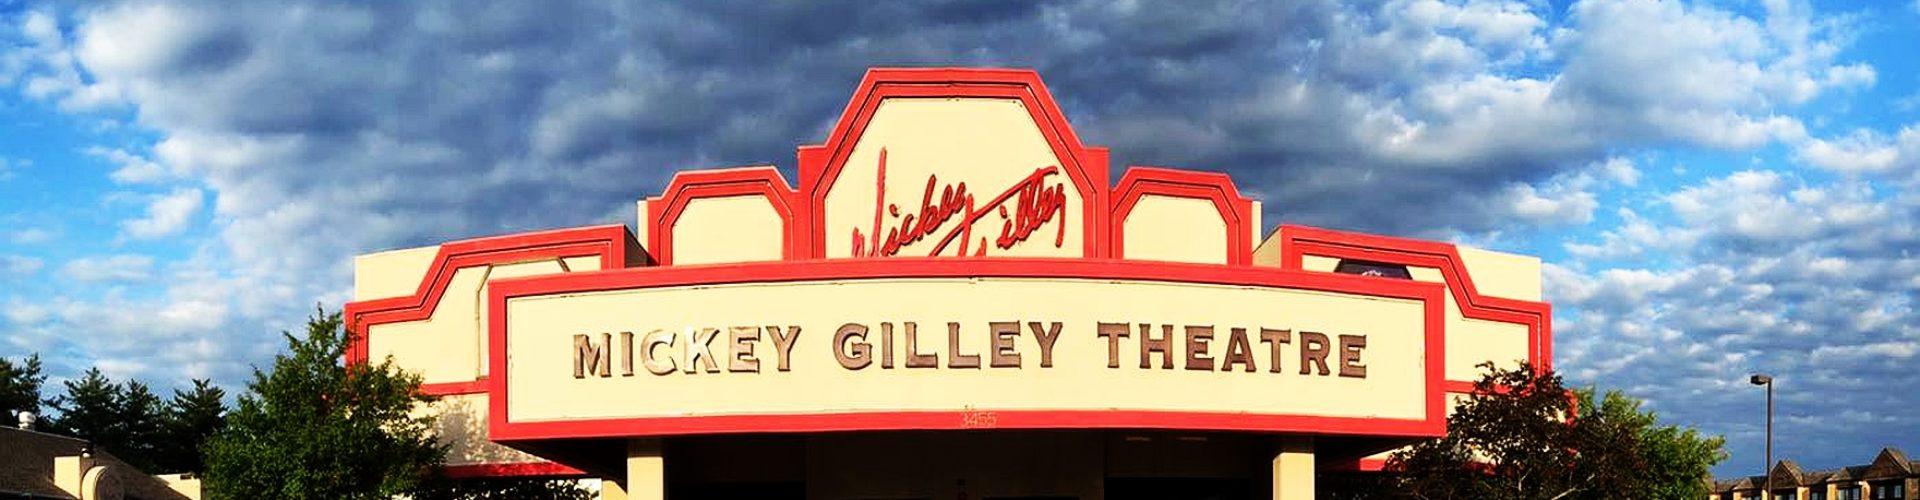 Grand Shanghai Mickey Gilley Theatre Branson Call 1